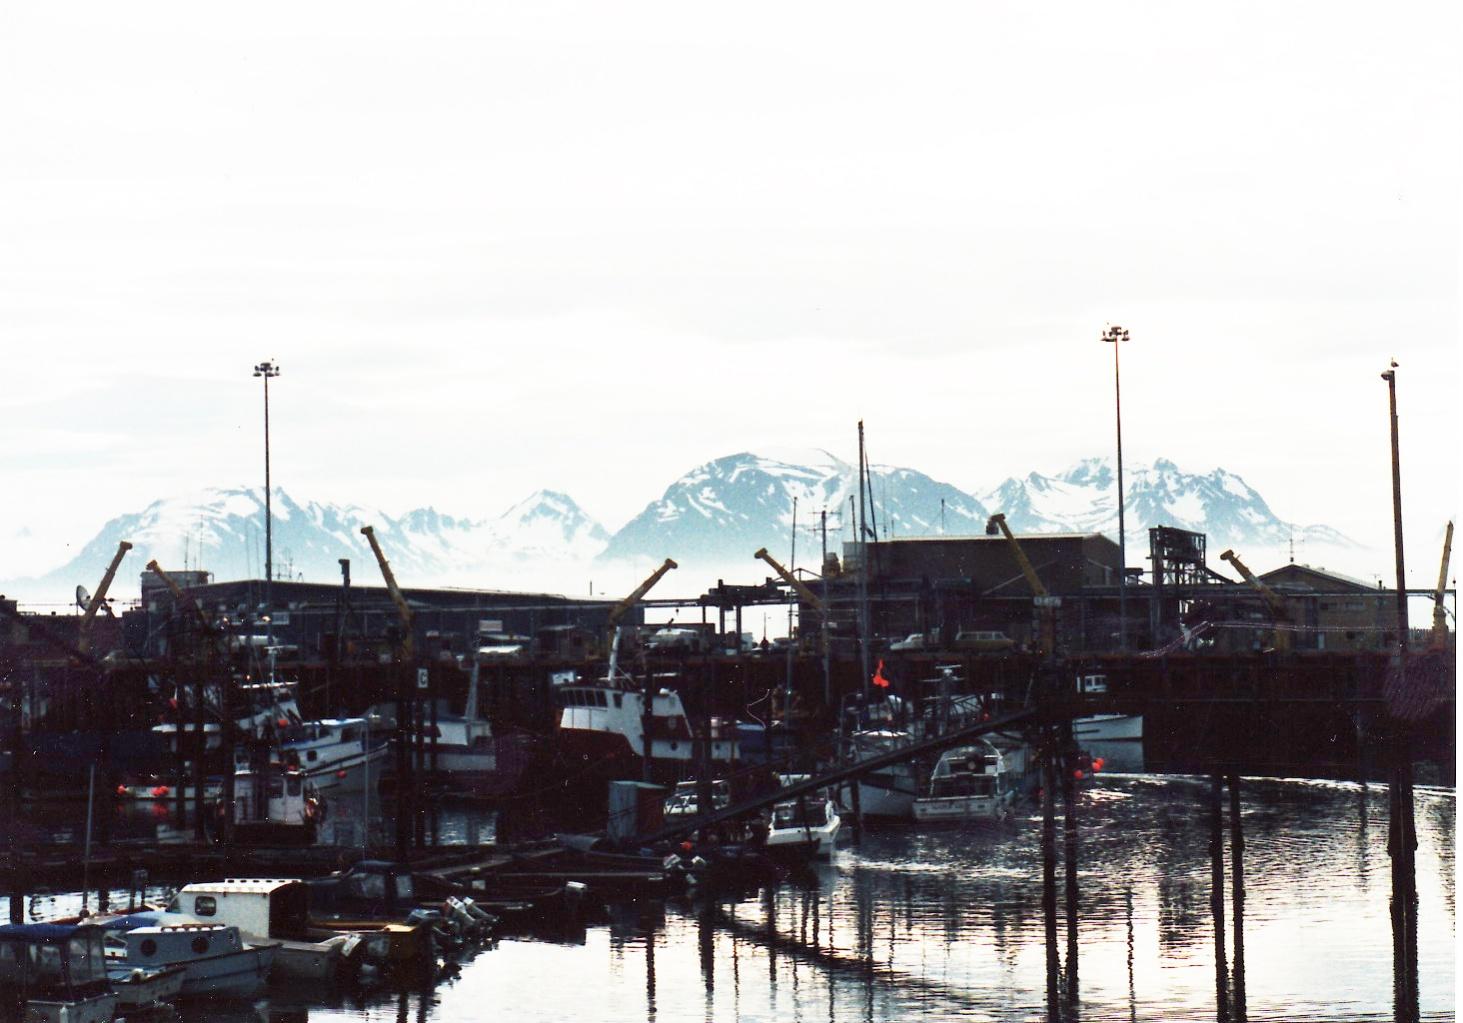 Click image for larger version  Name:Homer_marina.jpg Views:62 Size:362.6 KB ID:35474